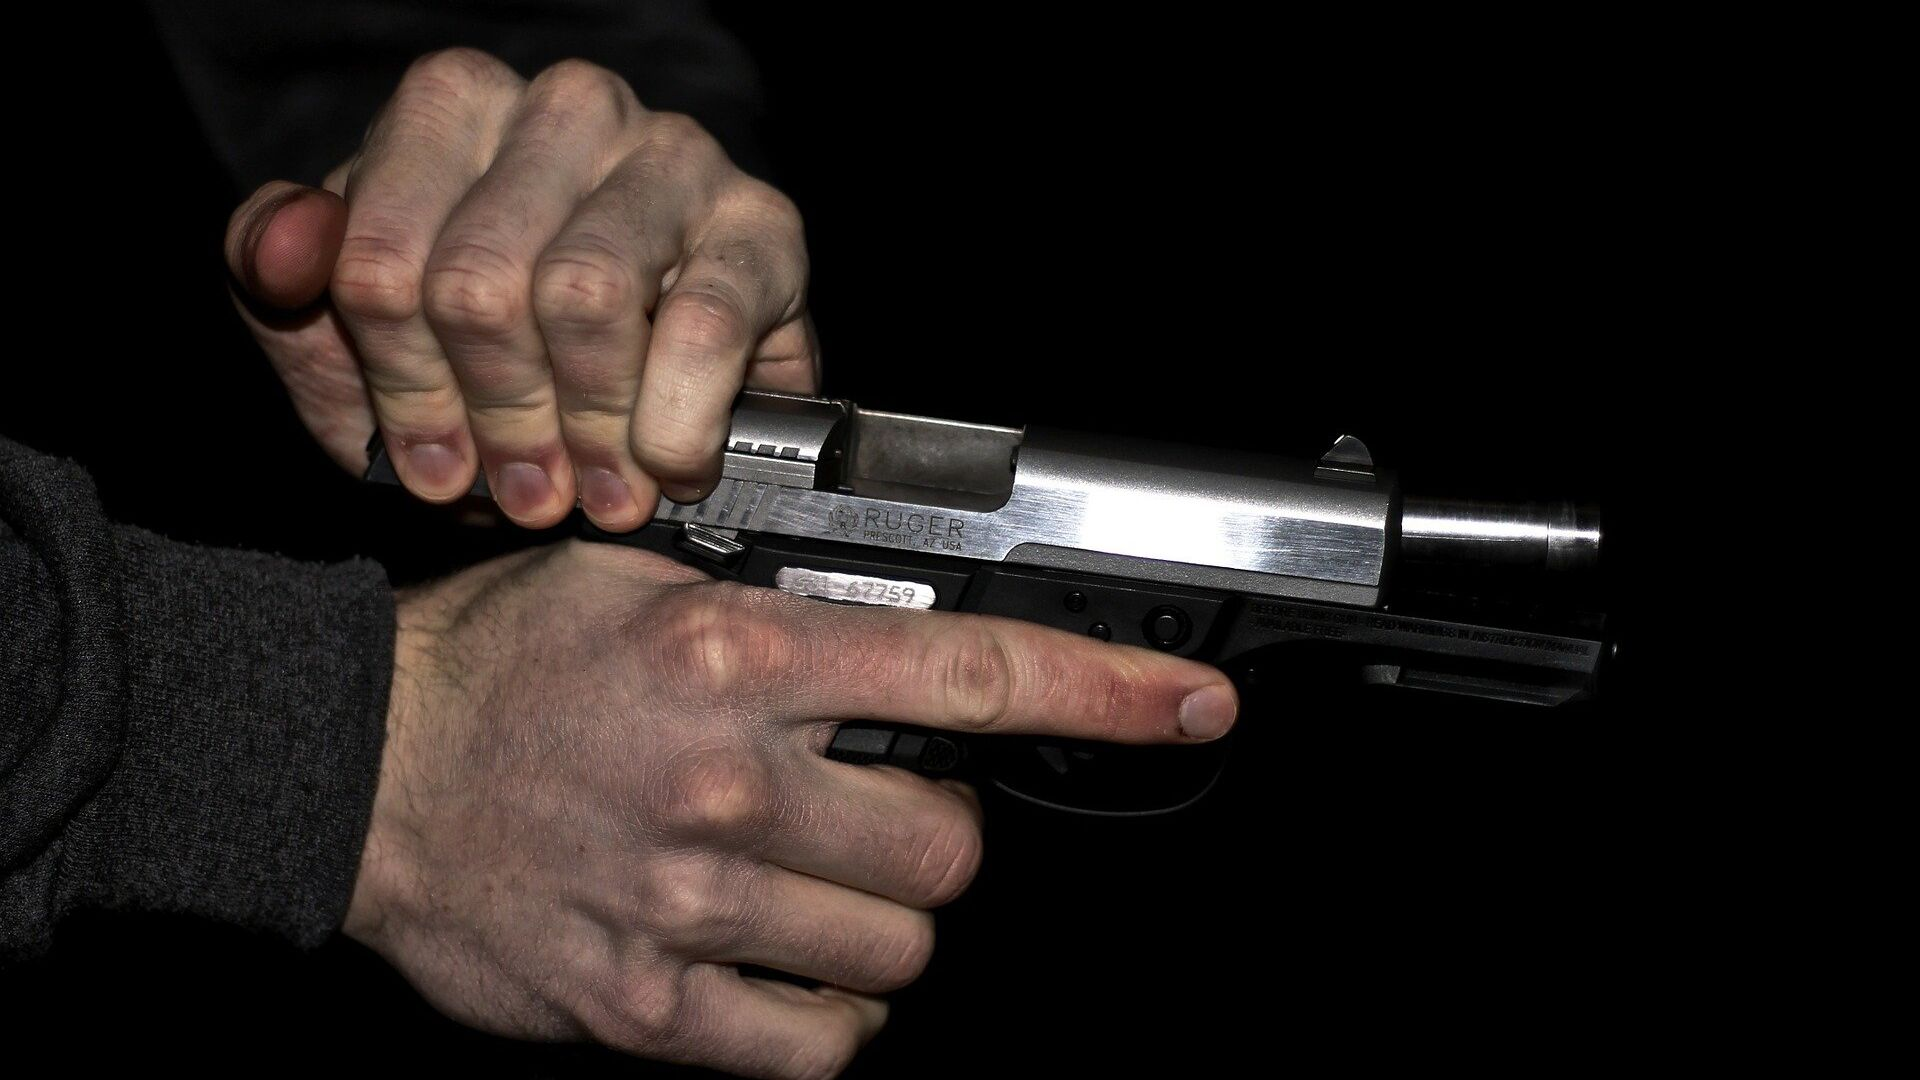 Una pistola (imagen referencial) - Sputnik Mundo, 1920, 08.10.2021